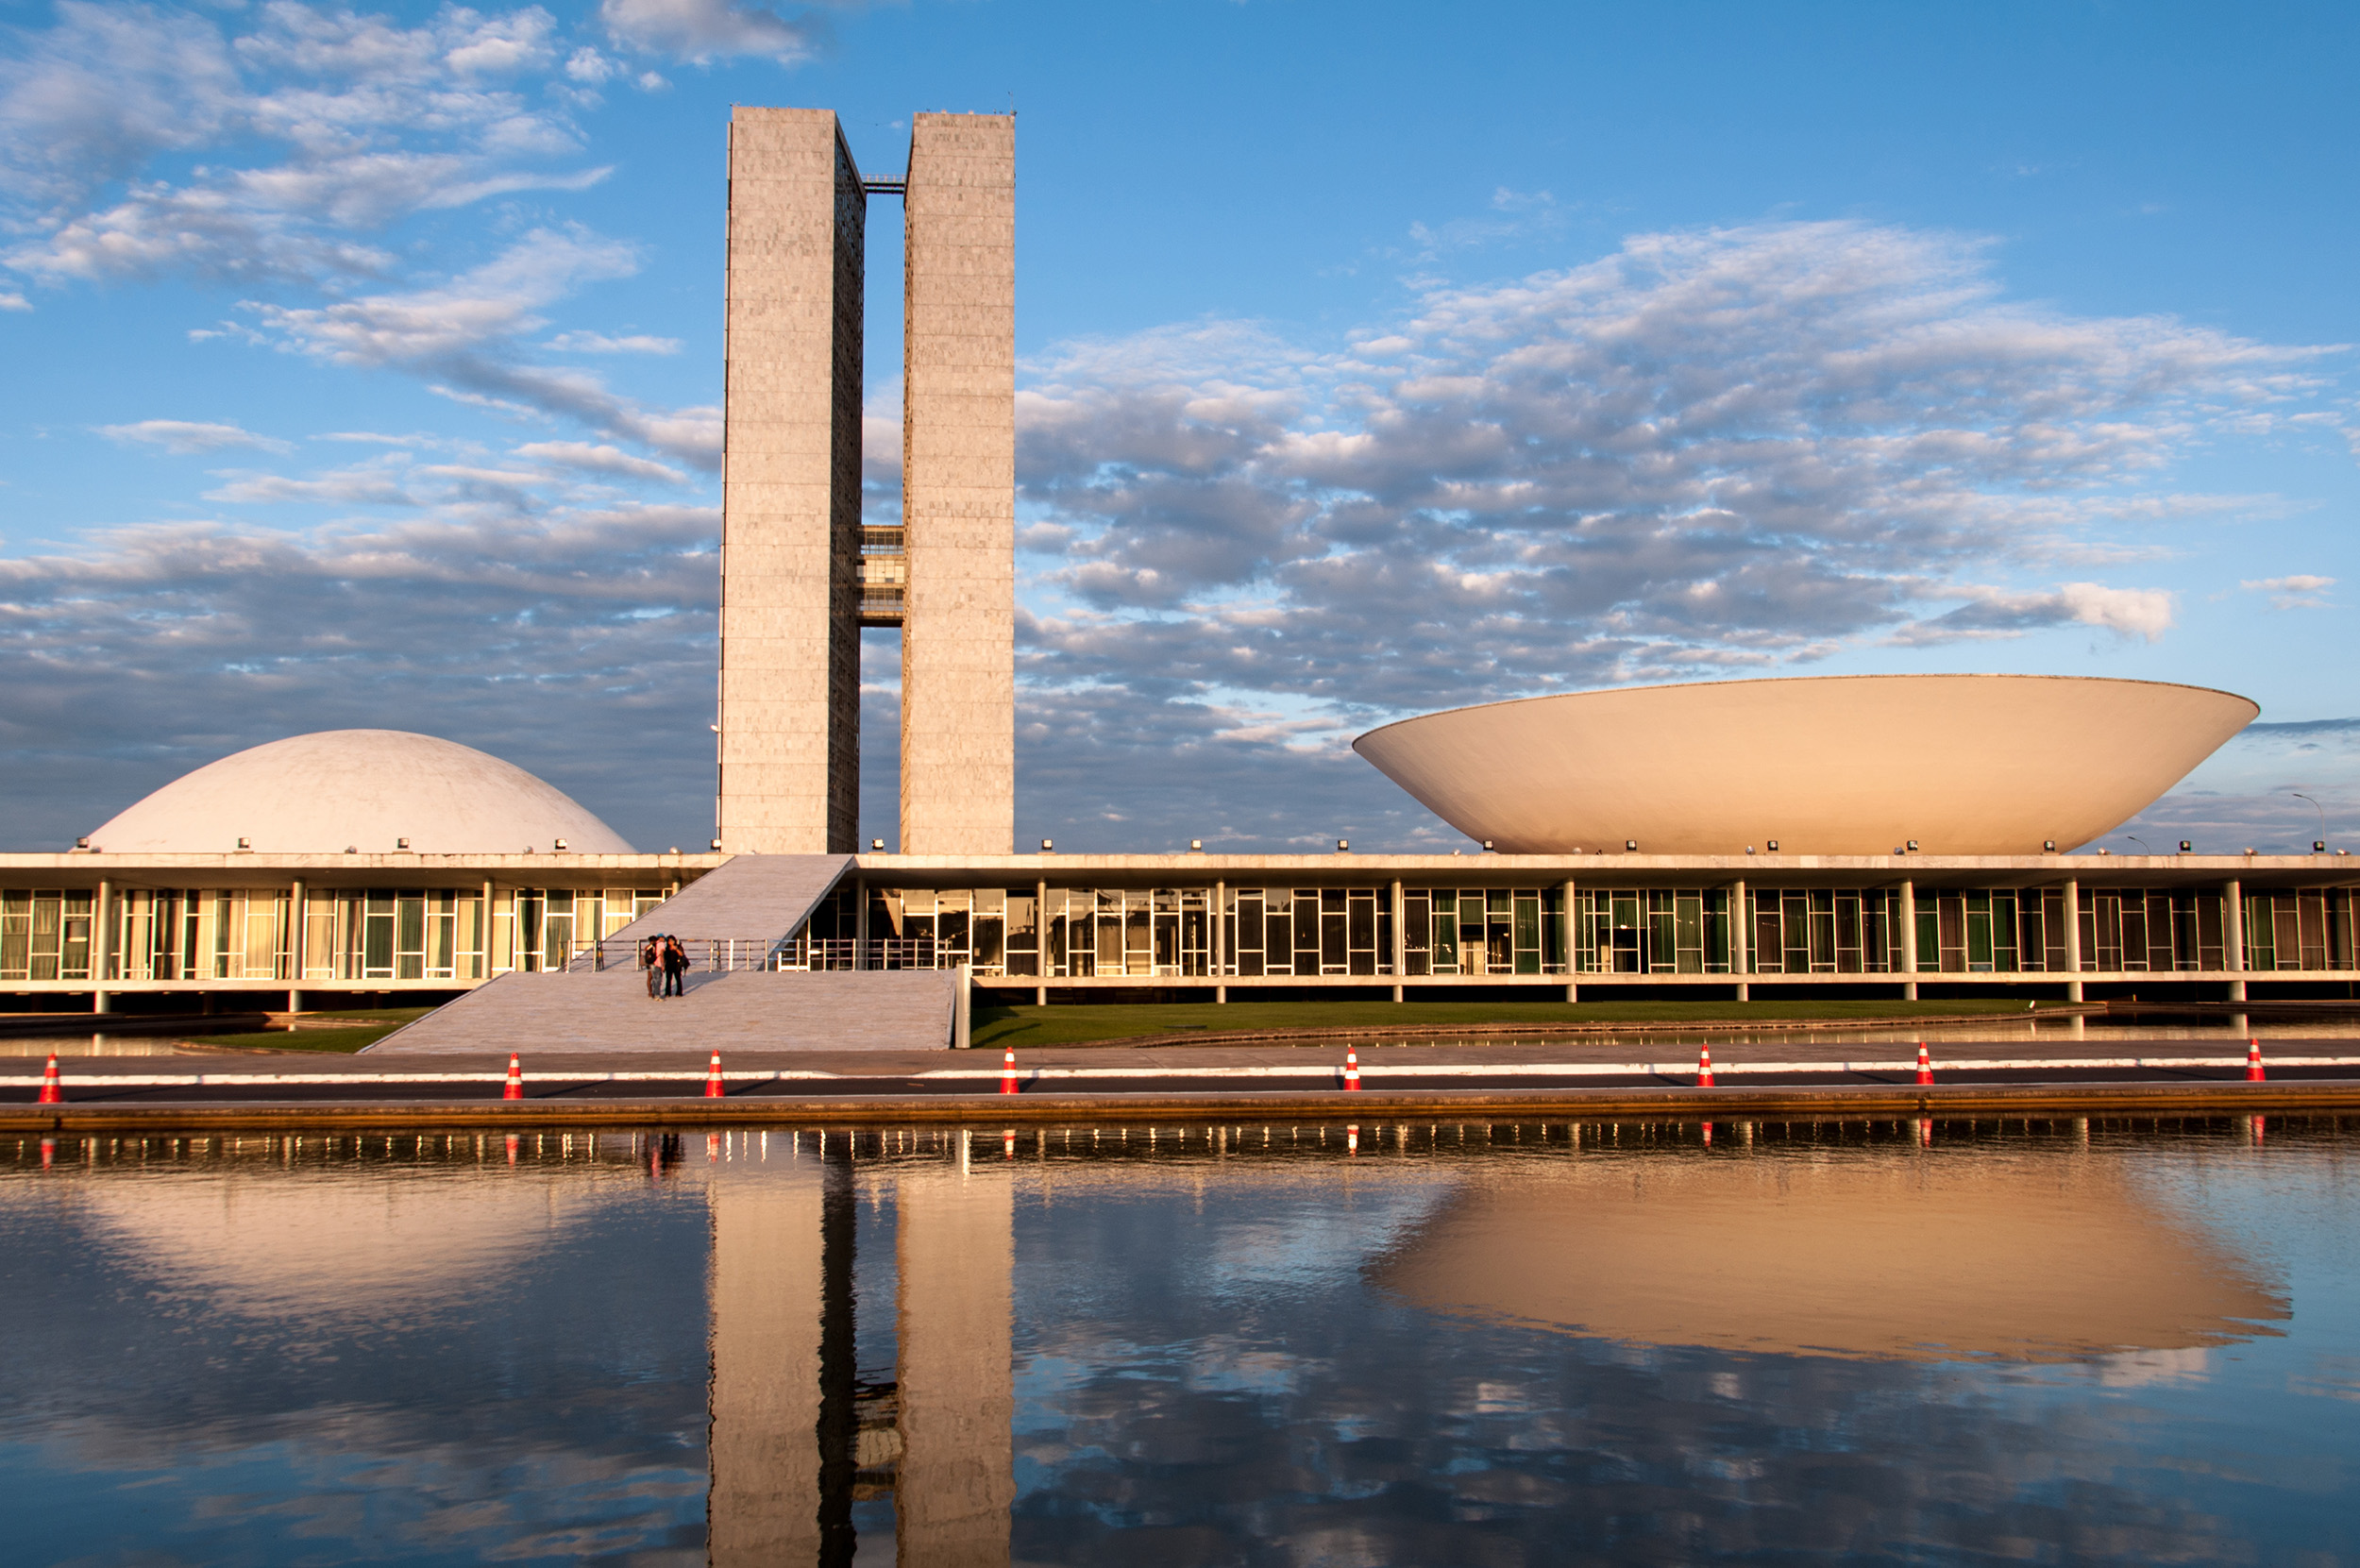 Brasilia National Congress